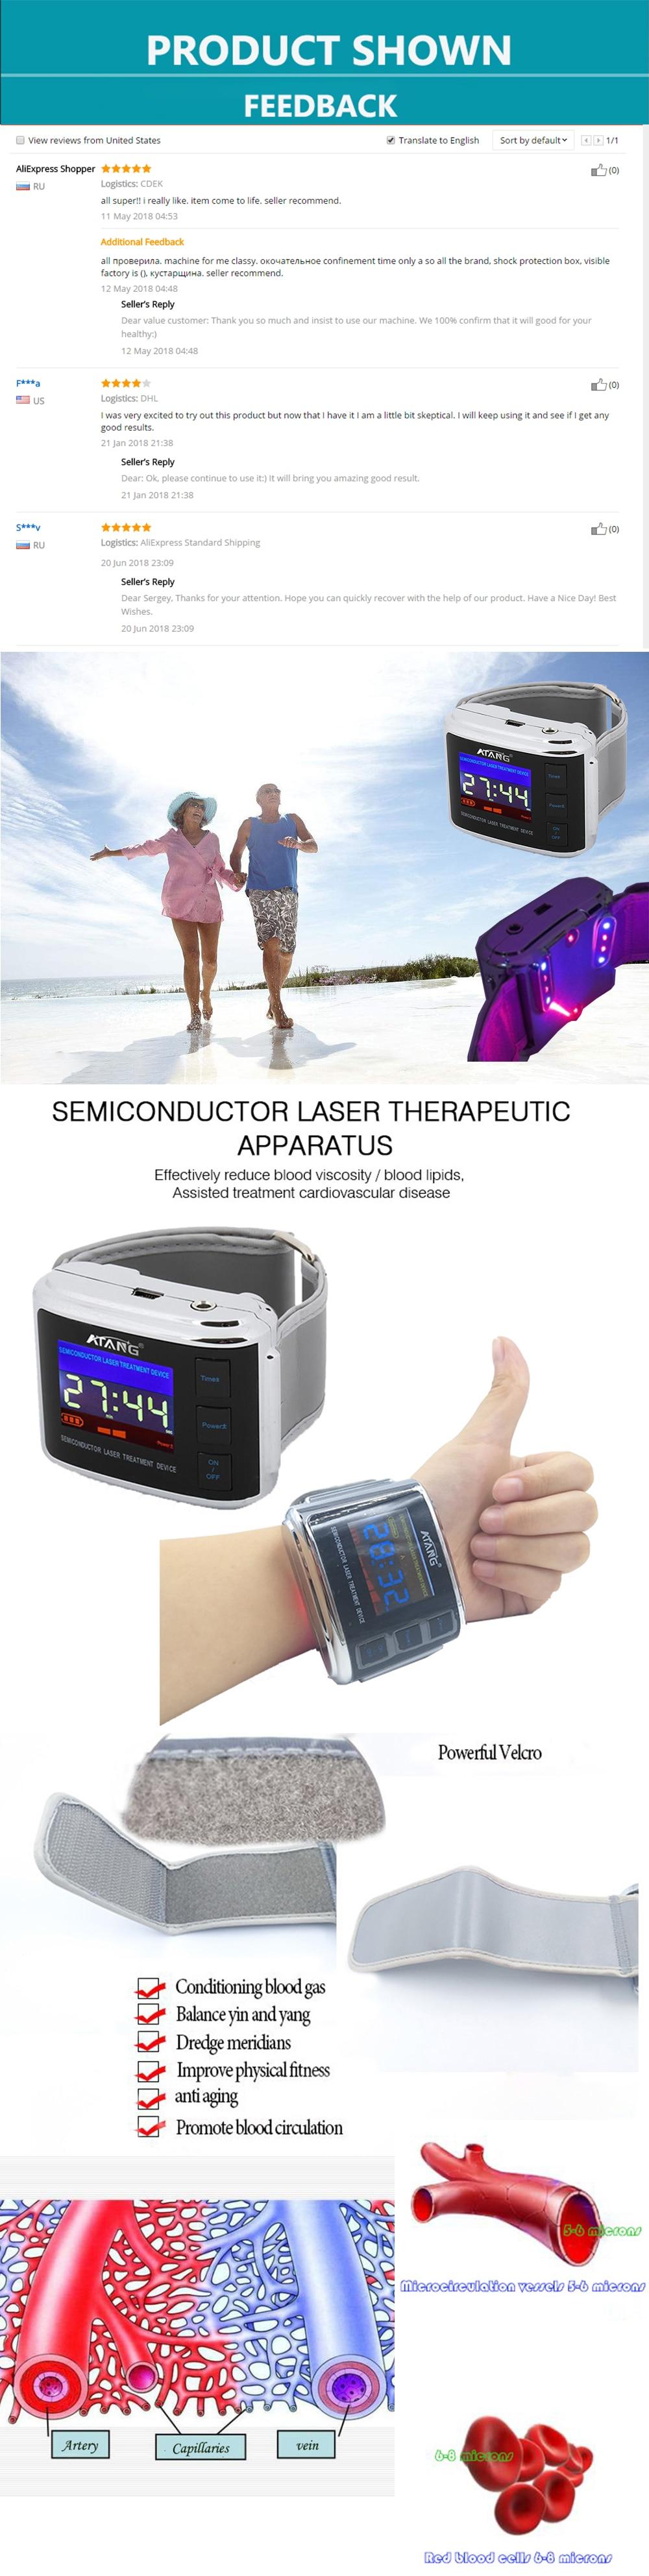 bio quantum energy red light laser treatment laser watch with red light  laser +lblue LED light wristwatch led physical apparatus